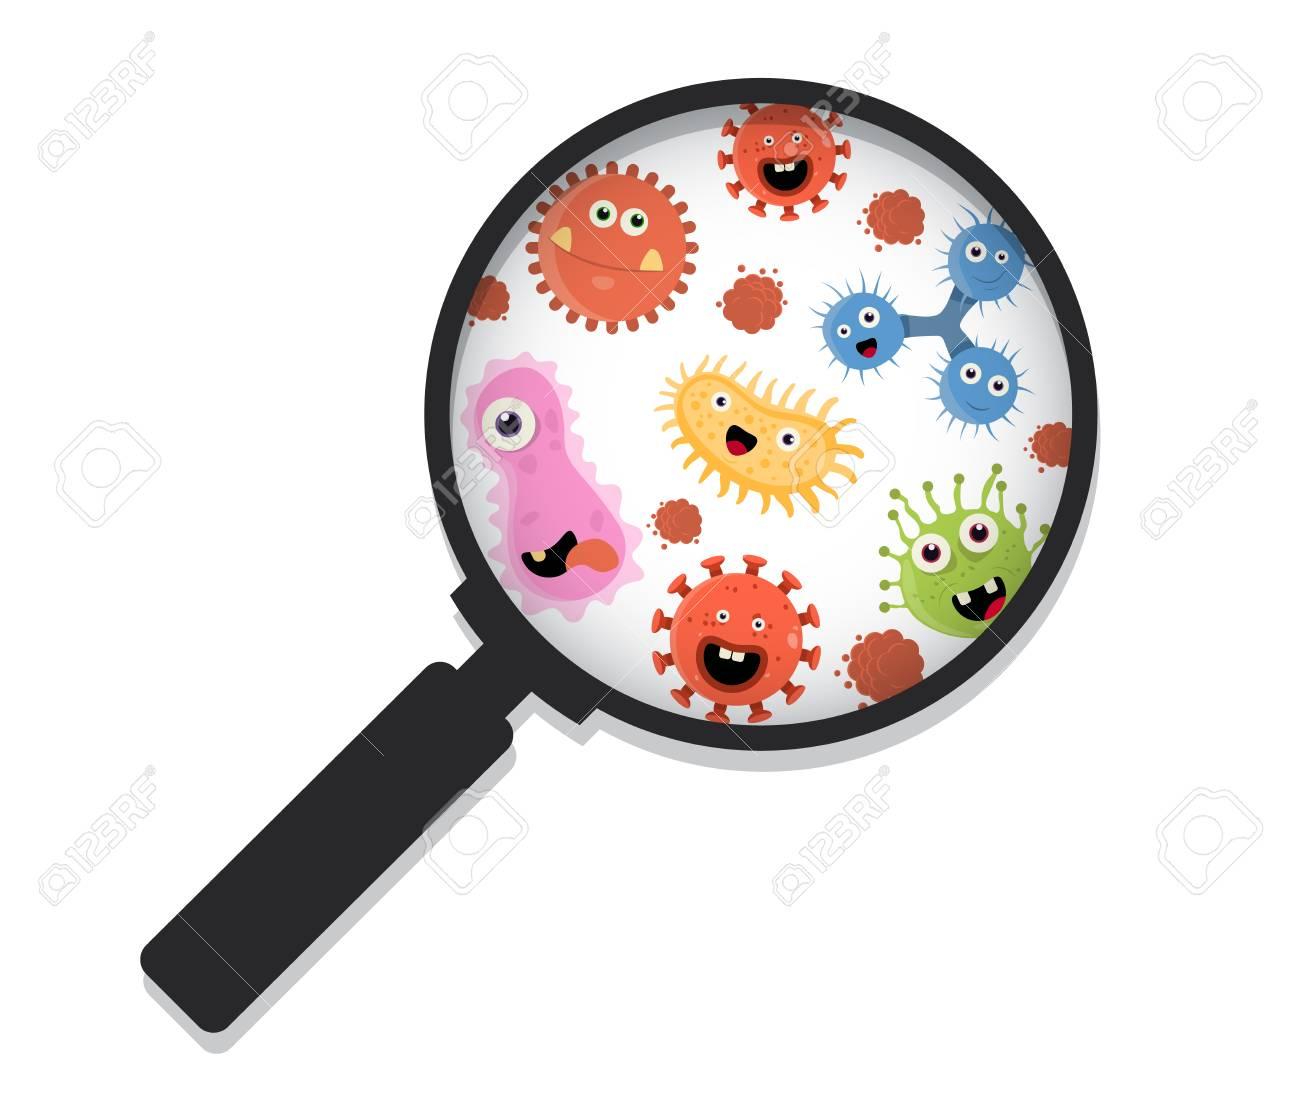 Cartoon bacteria under a magnifying glass vector illustration.